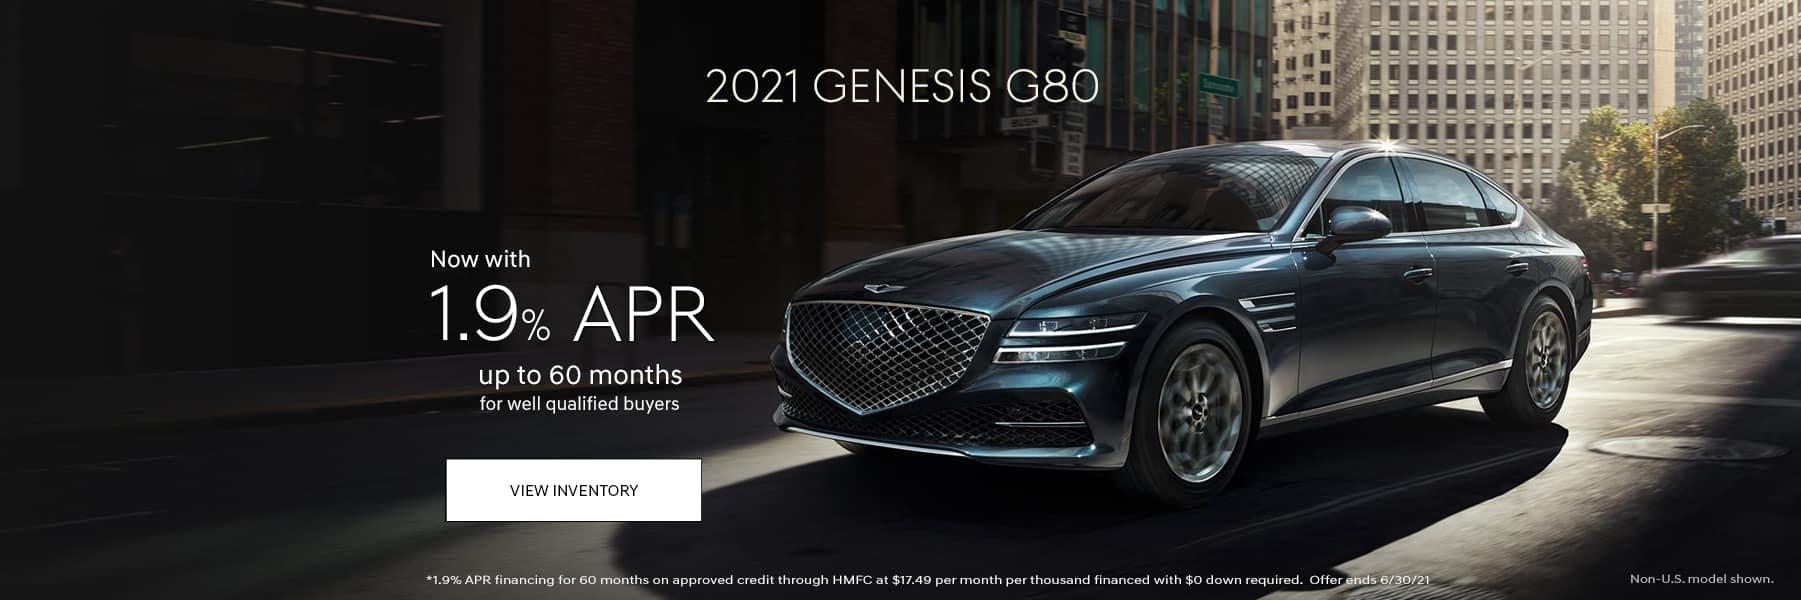 2021-Genesis-G80-Jun21